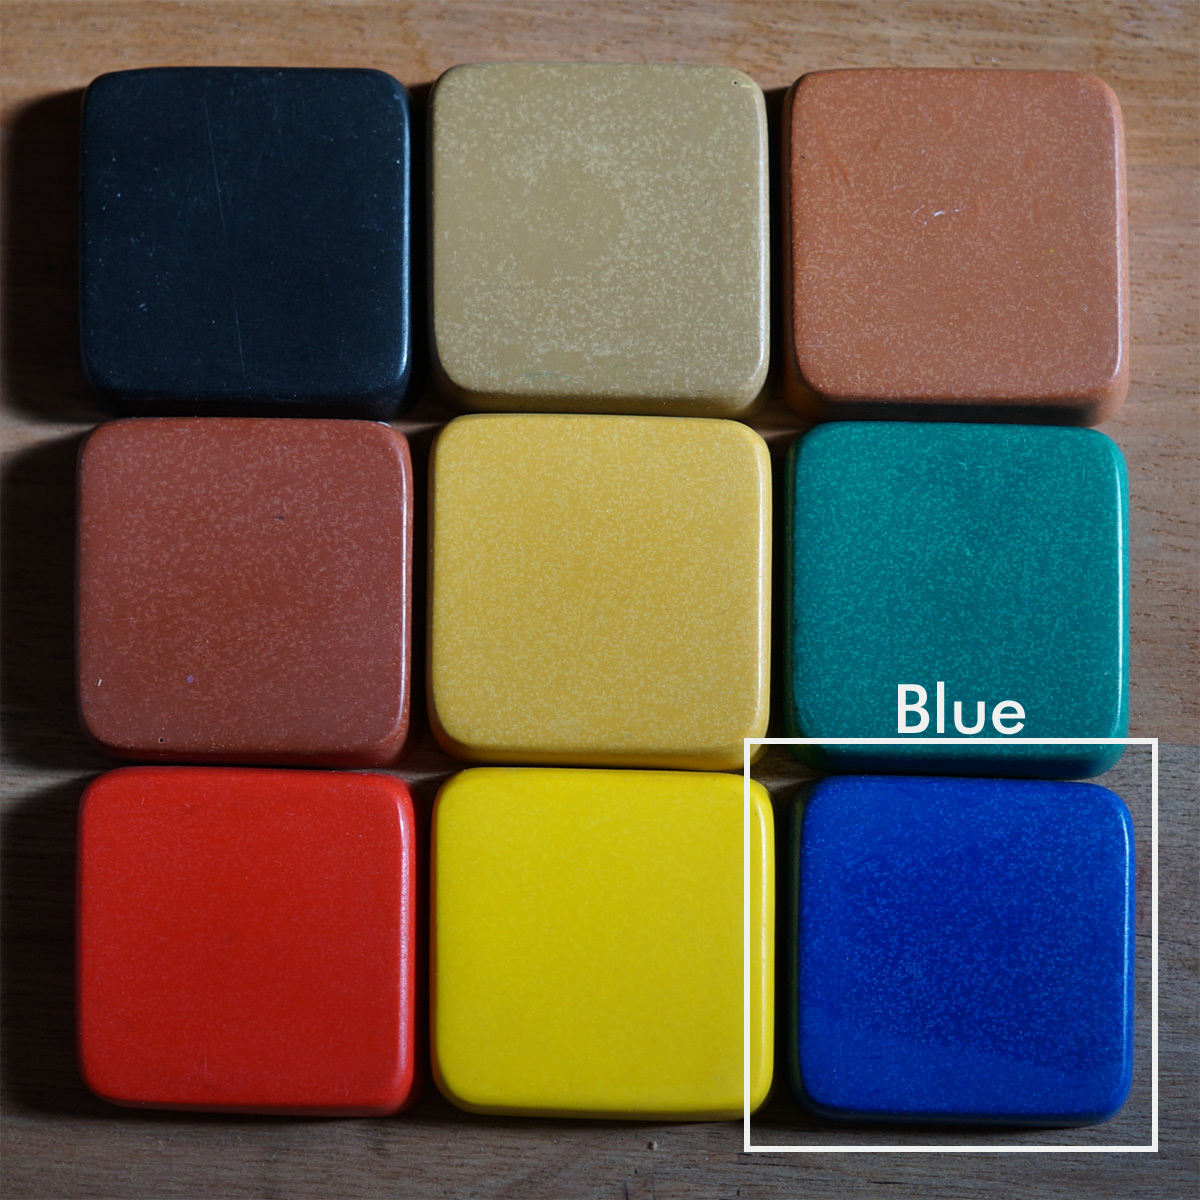 PIGMENT BLUE 300g(着色剤:青 300g) - 画像2